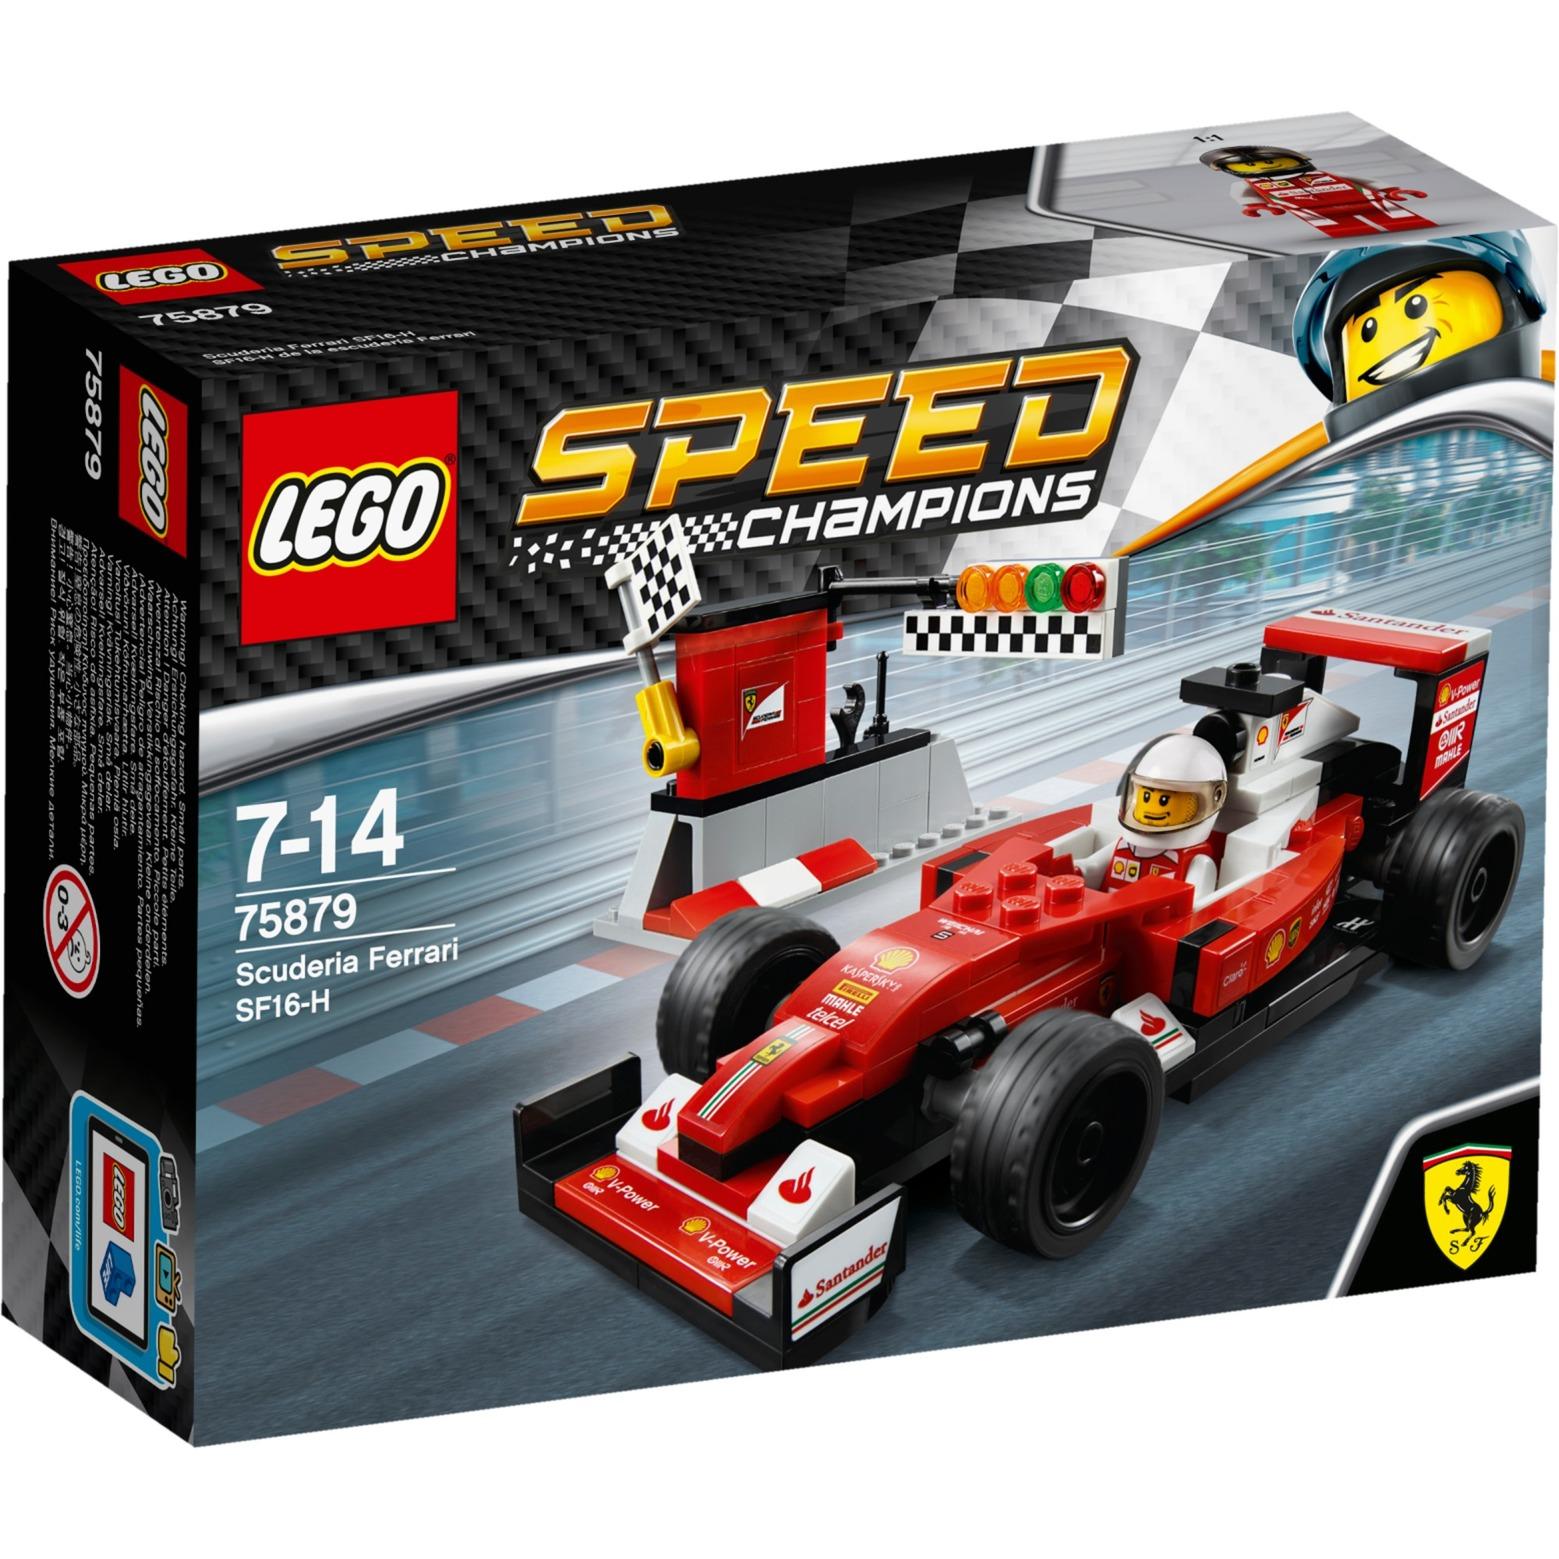 Speed Champions - Scuderia Ferrari SF16-H, Jouets de construction